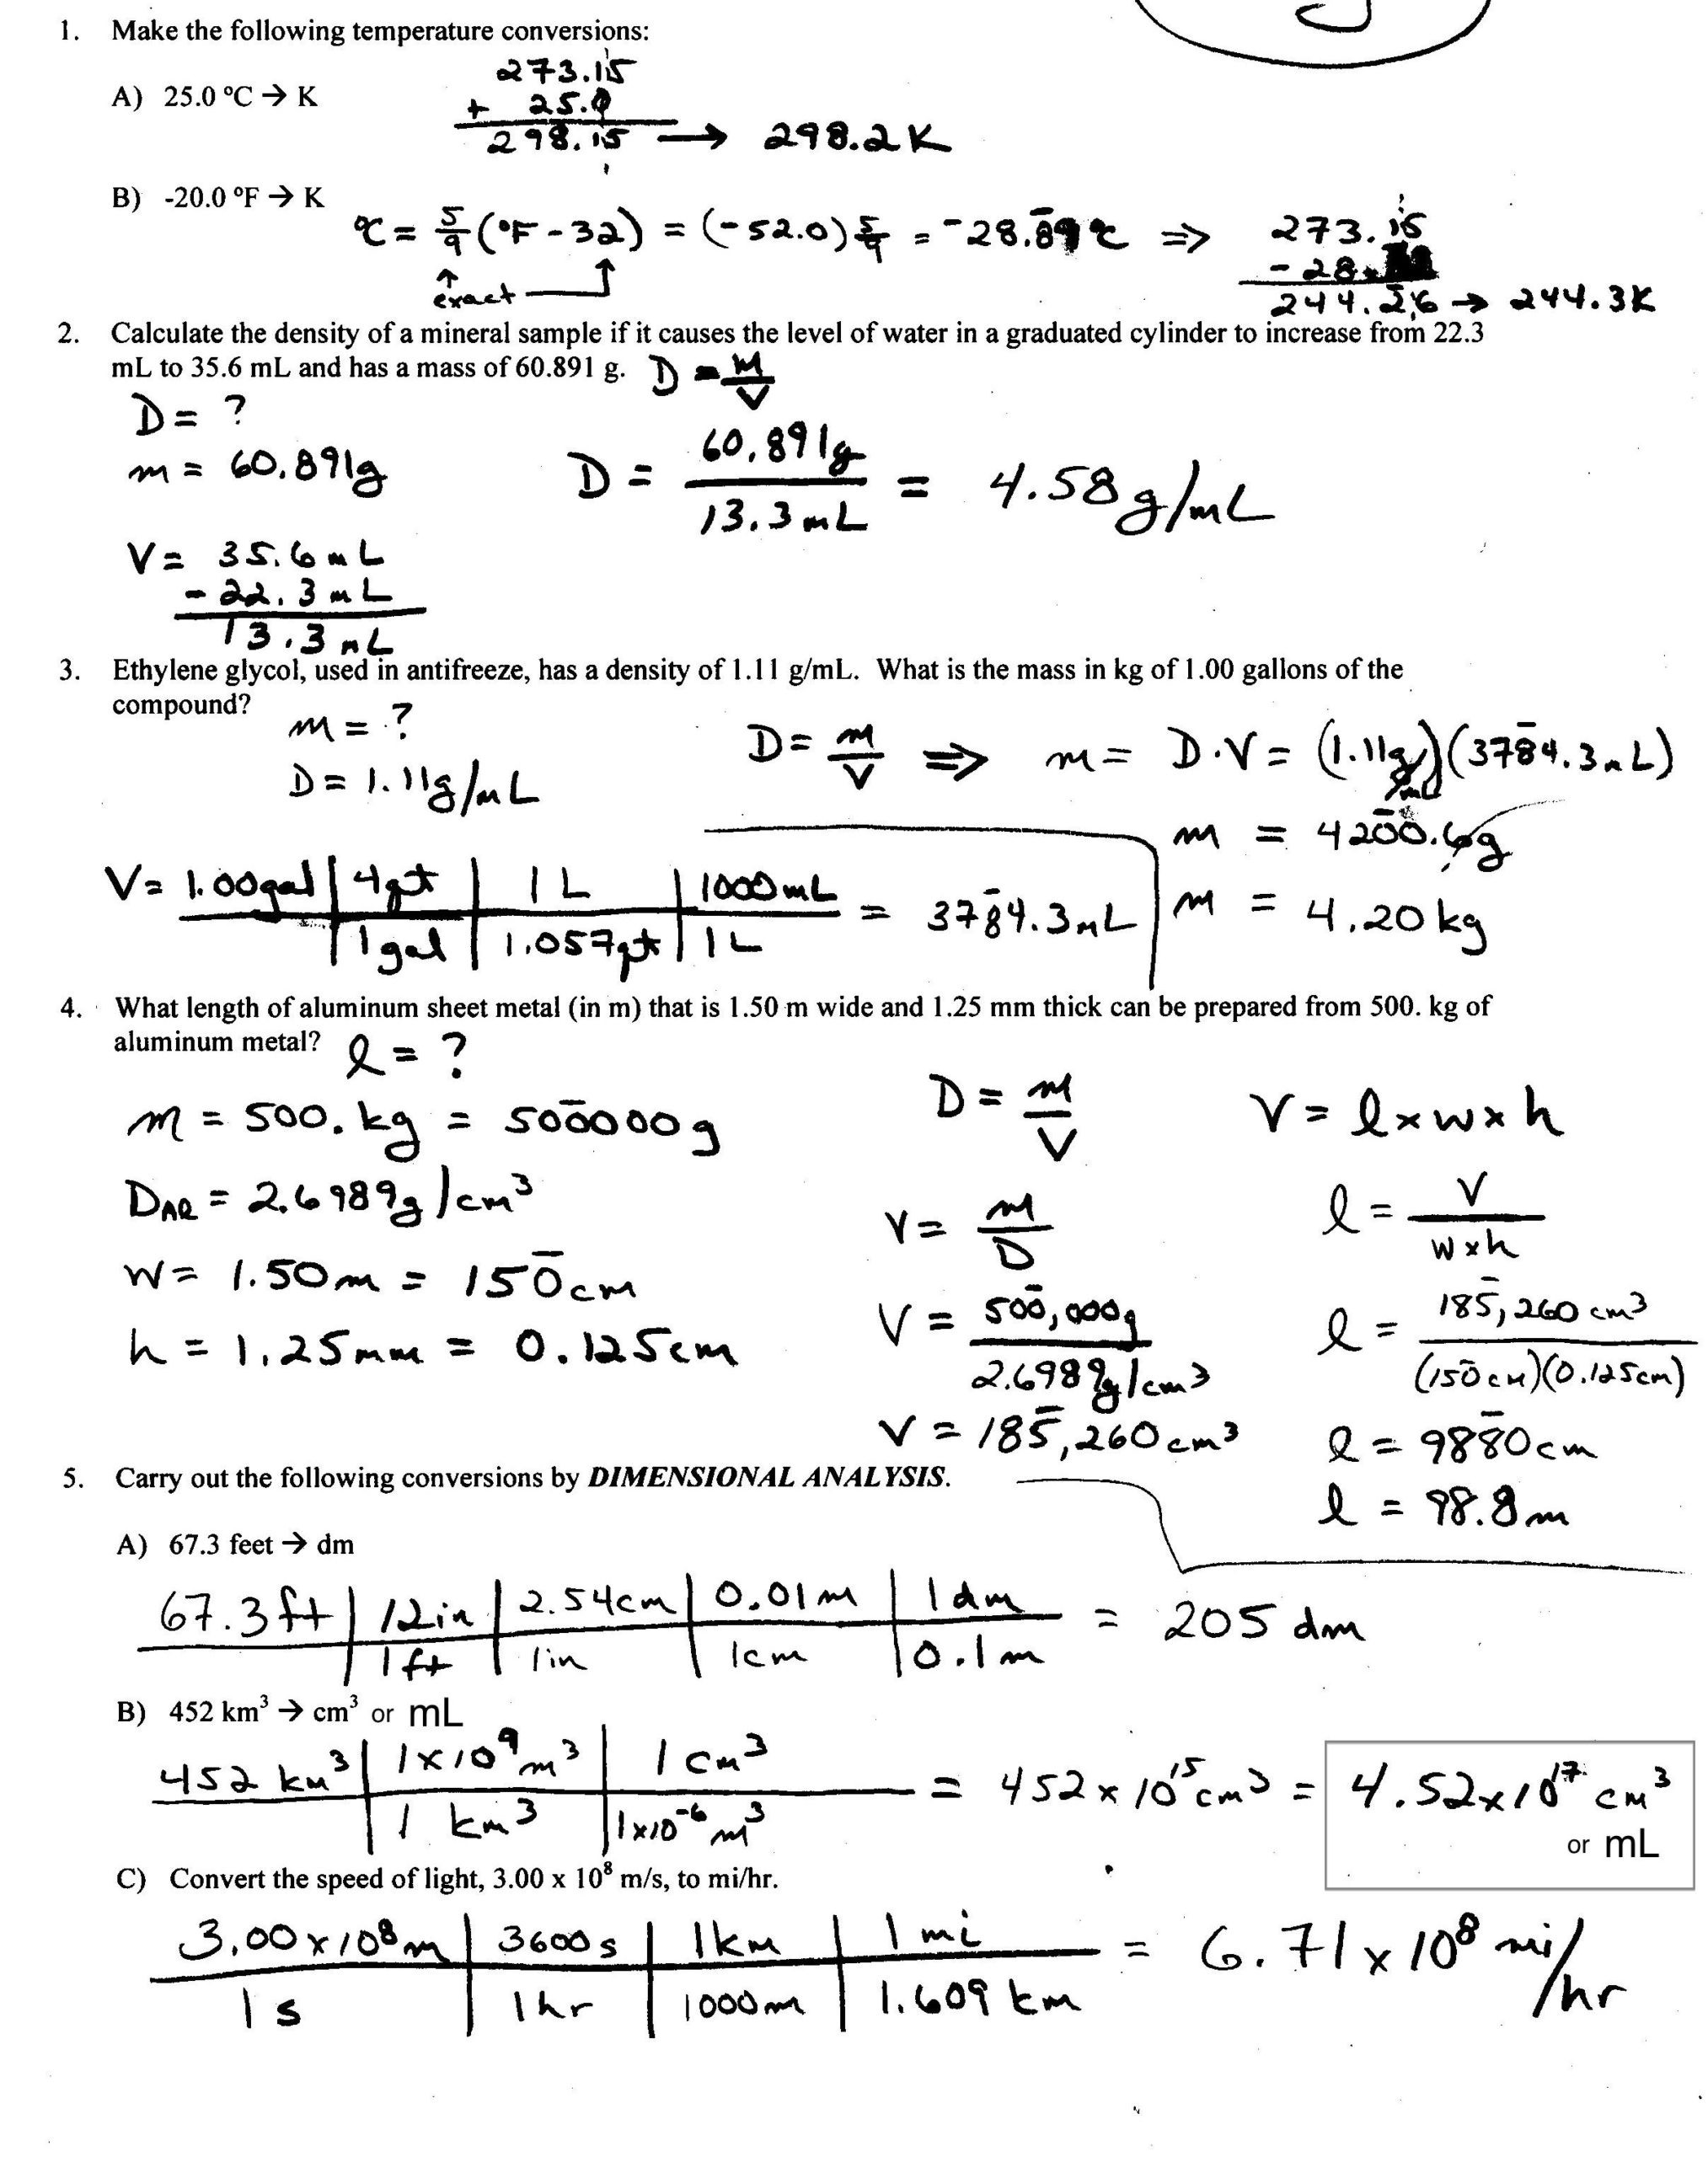 Density Calculations Worksheet Answer Key Density Worksheet with Answers Calculate Worksheets Answer